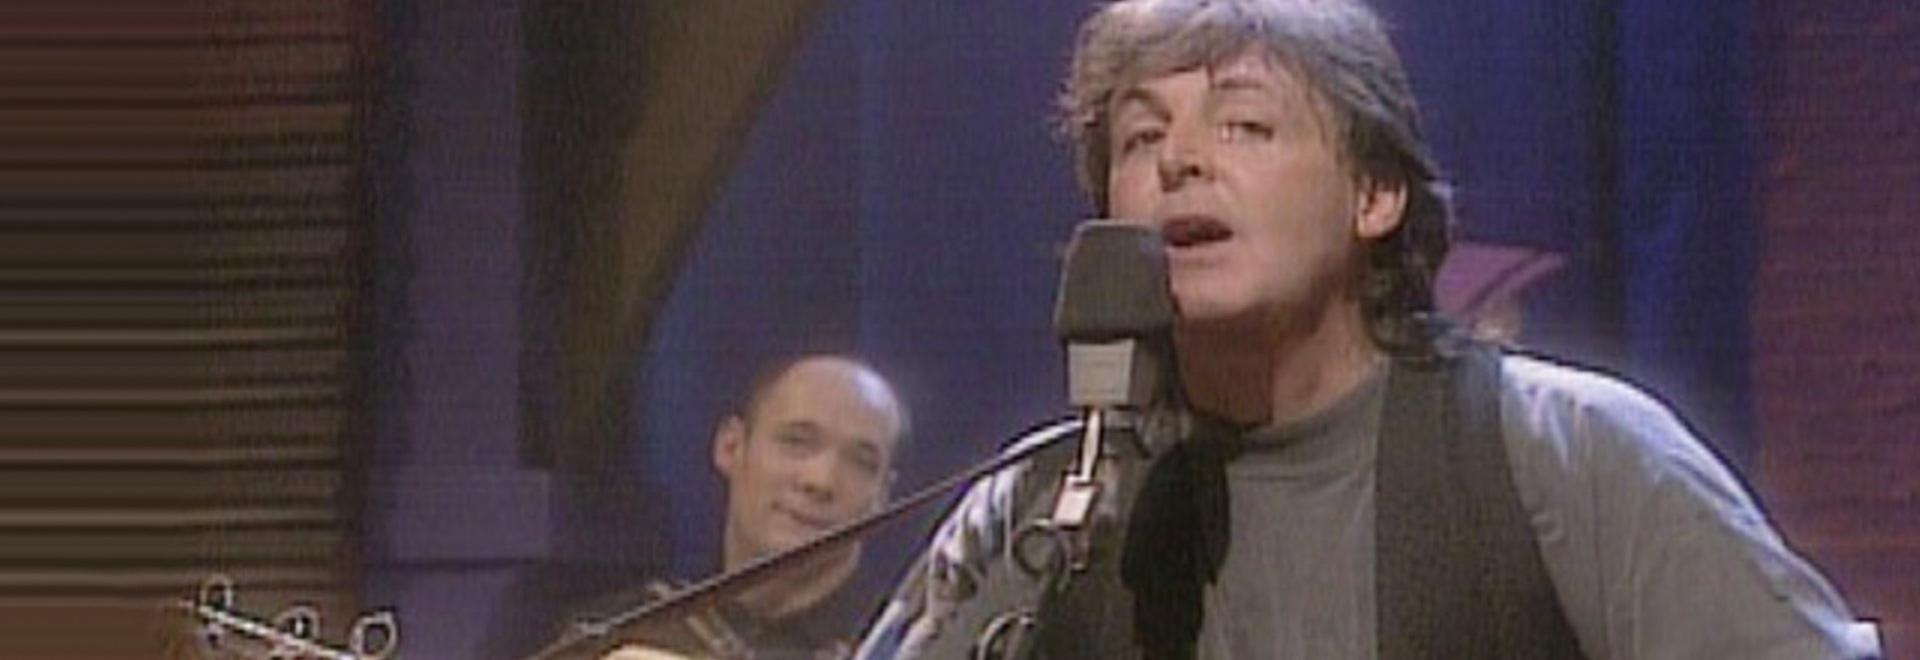 MTV Unplugged: Paul McCartney